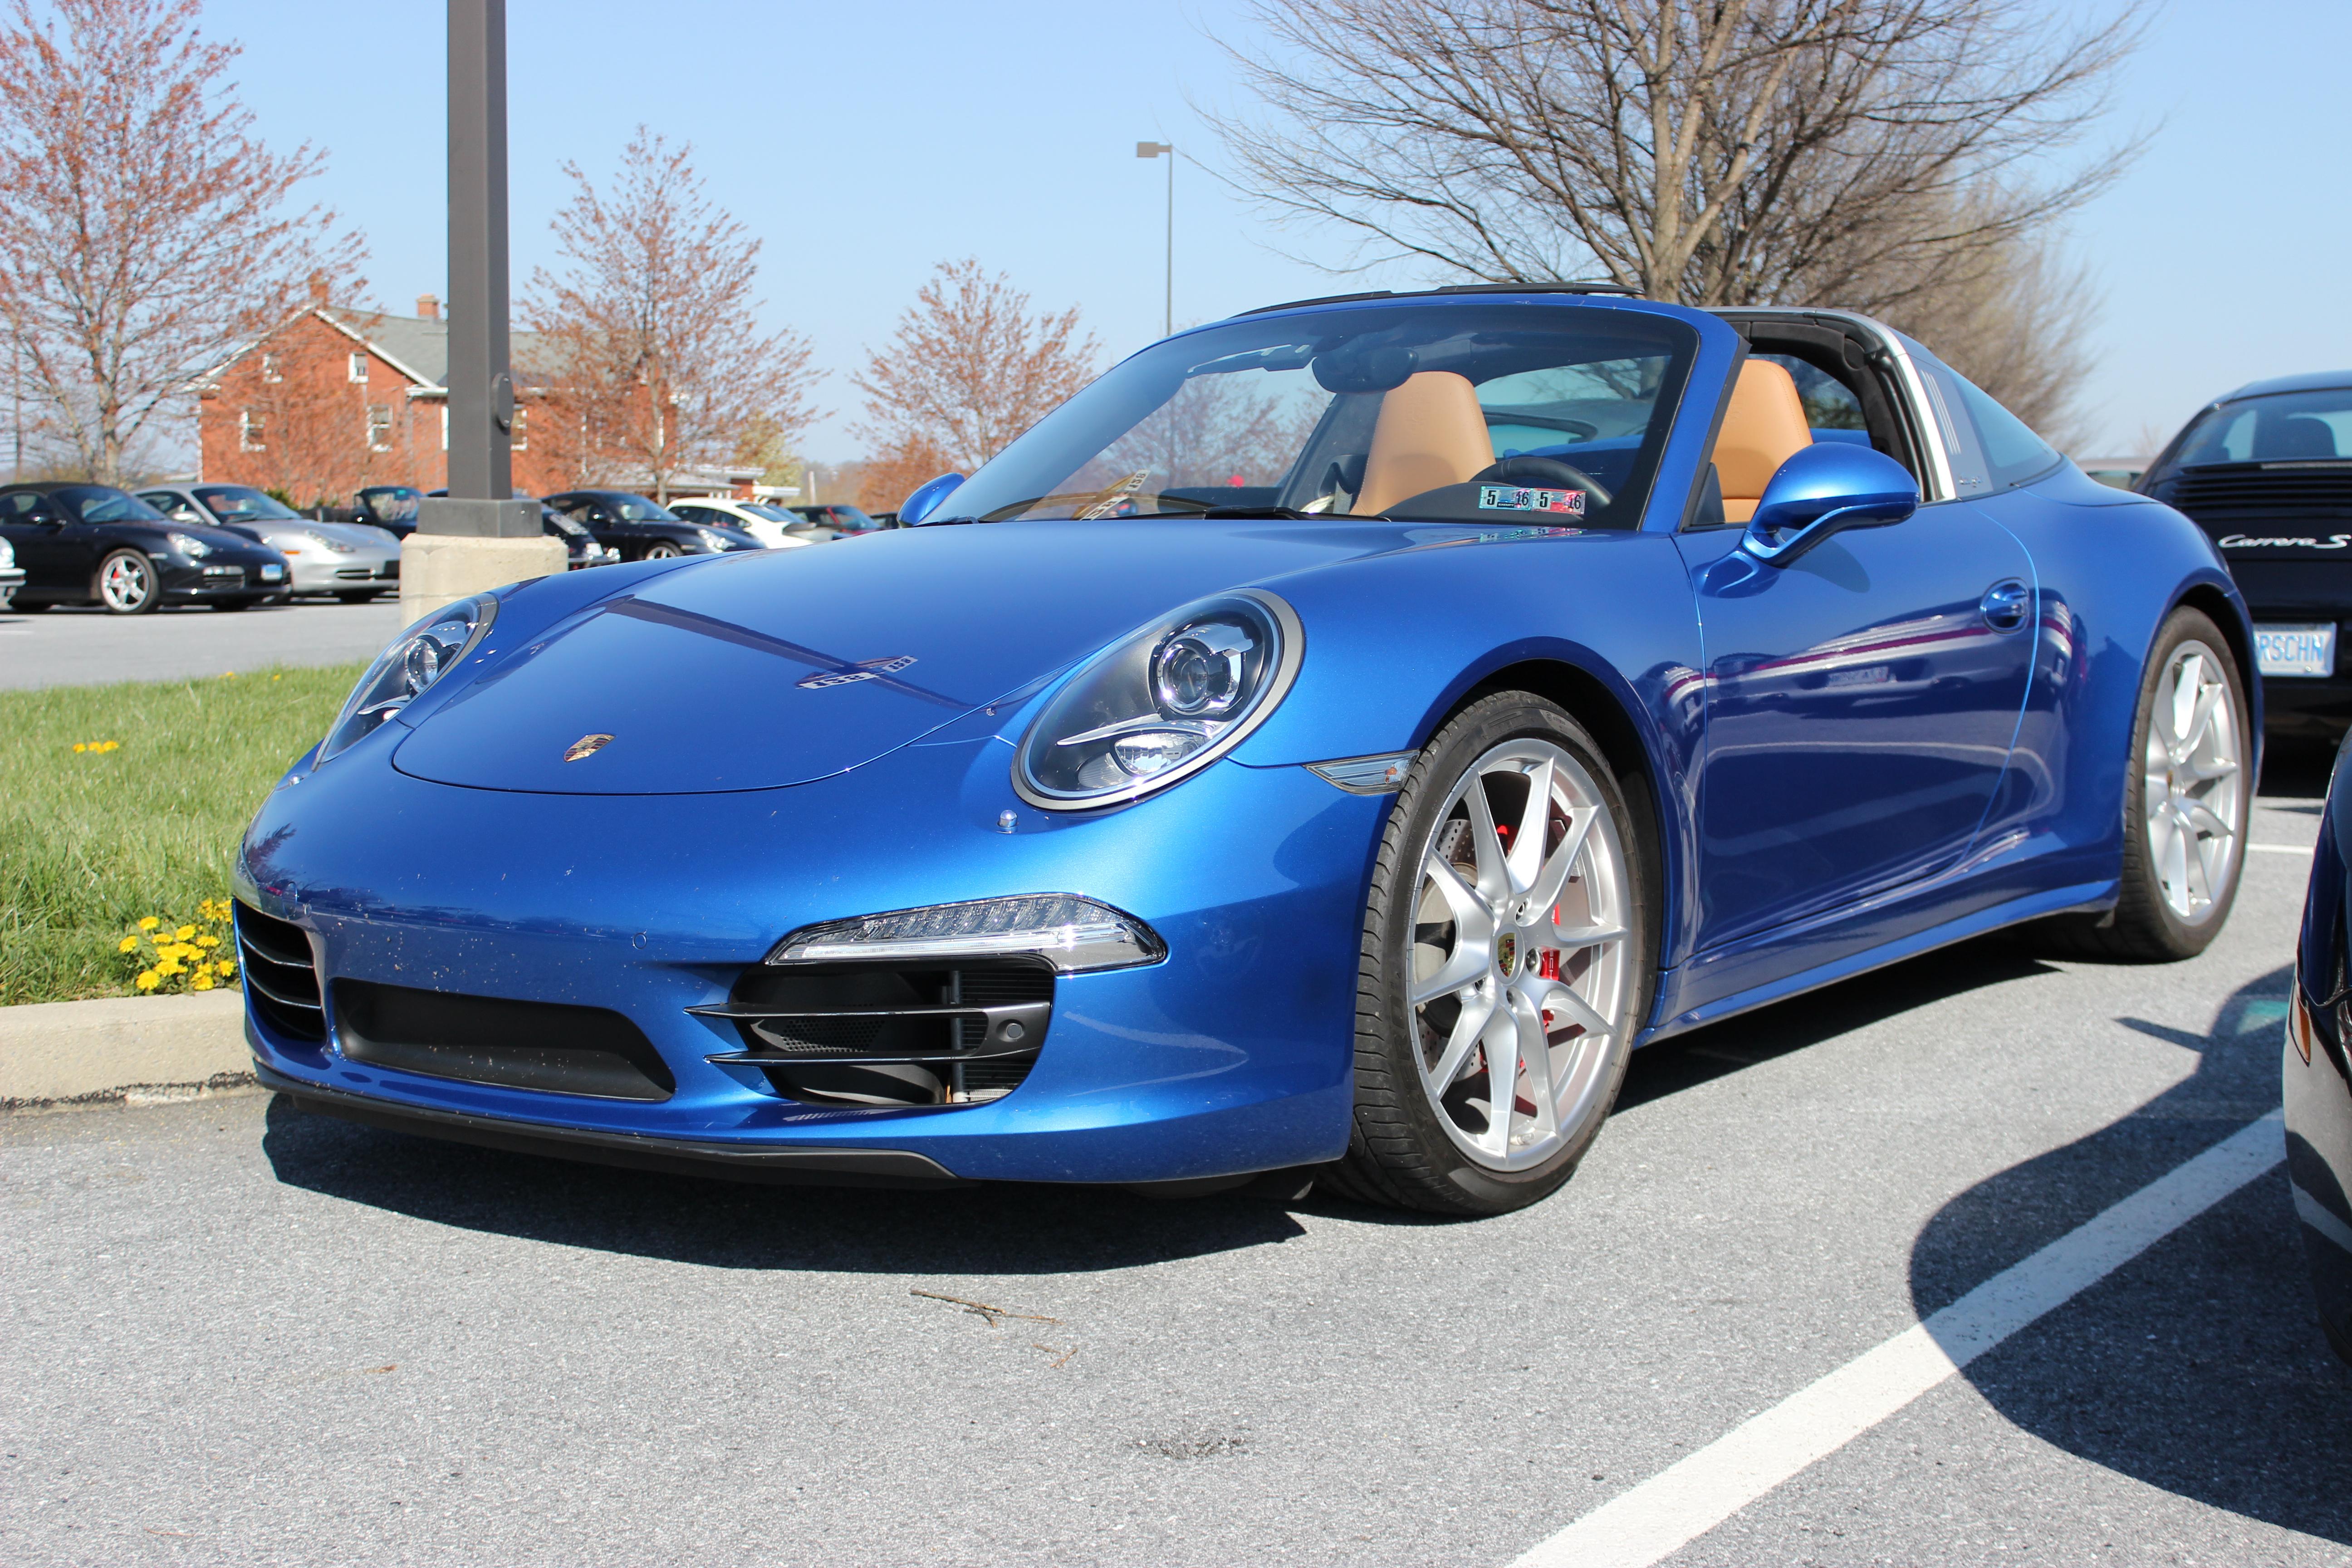 File Porsche 911 Targa 4s 991 26380557922 Jpg Wikimedia Commons